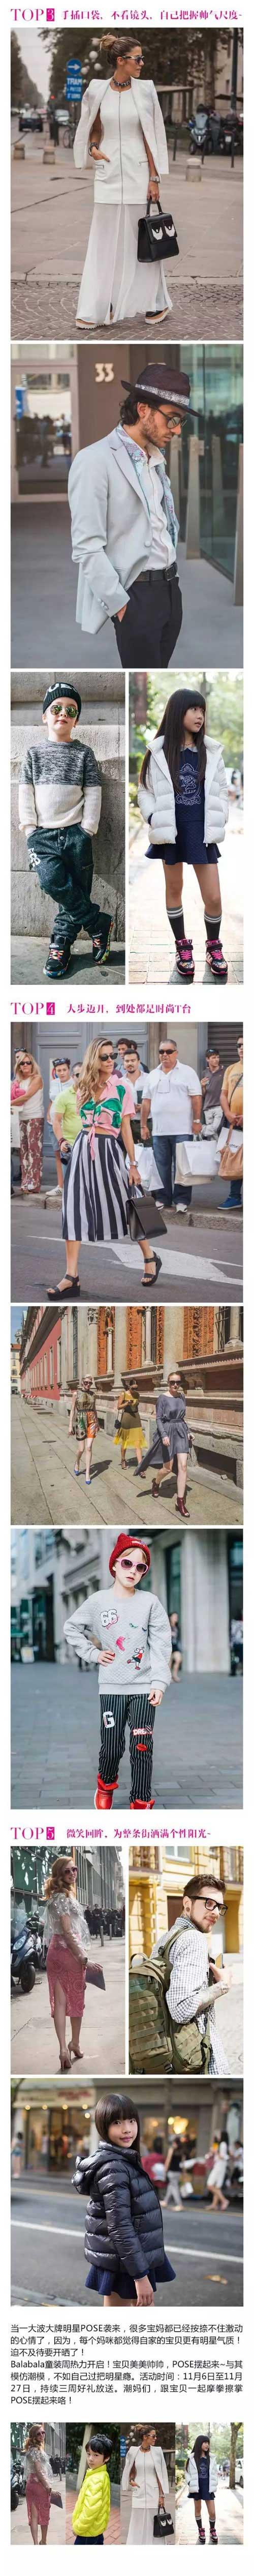 Fashion Week火热开启,全球时装周必学潮POSE TOP5学起来